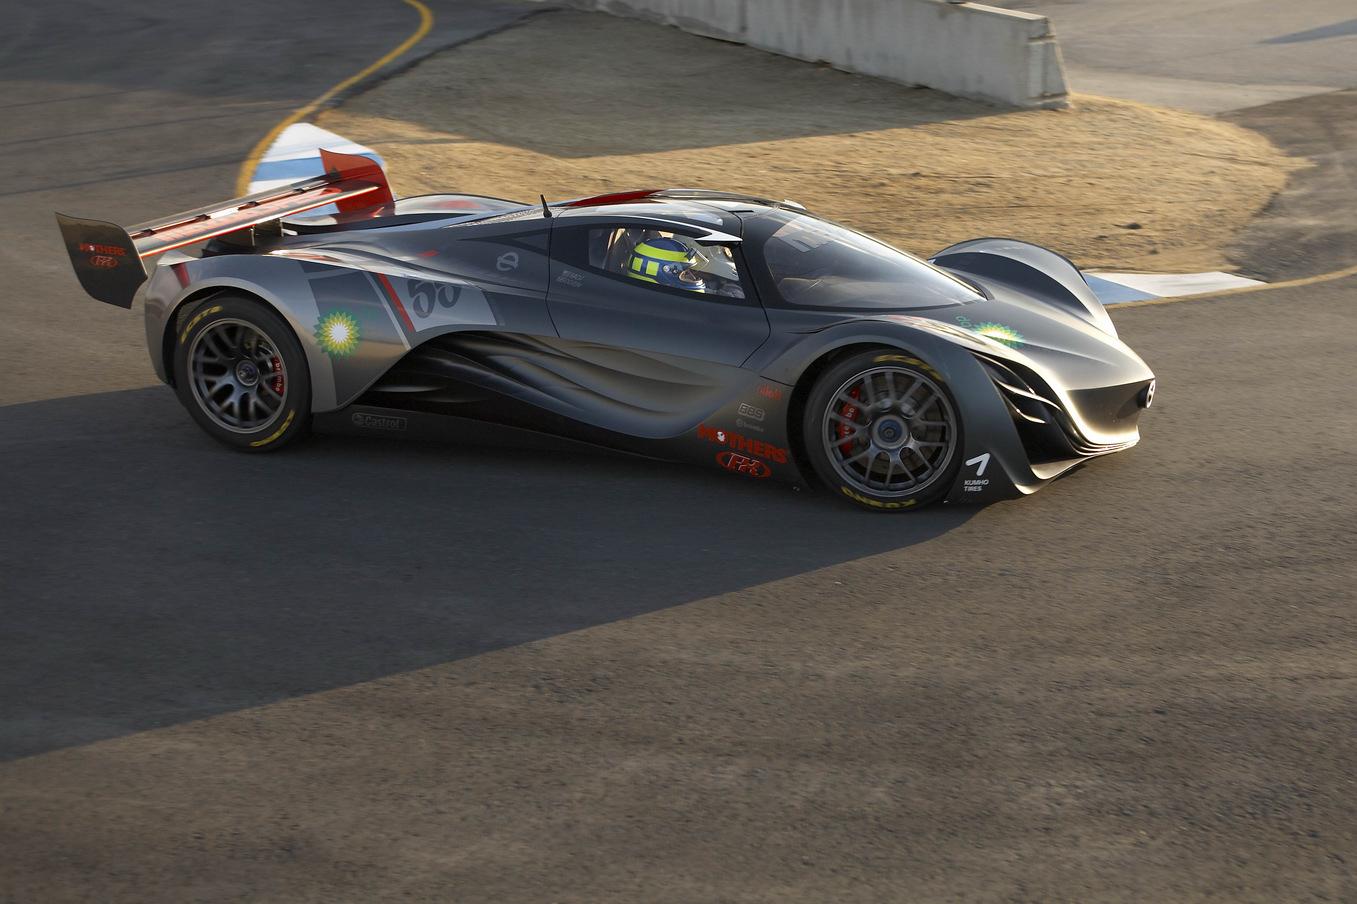 Image - Mazda Furai Concept 14.jpg | Autopedia | FANDOM powered by Wikia